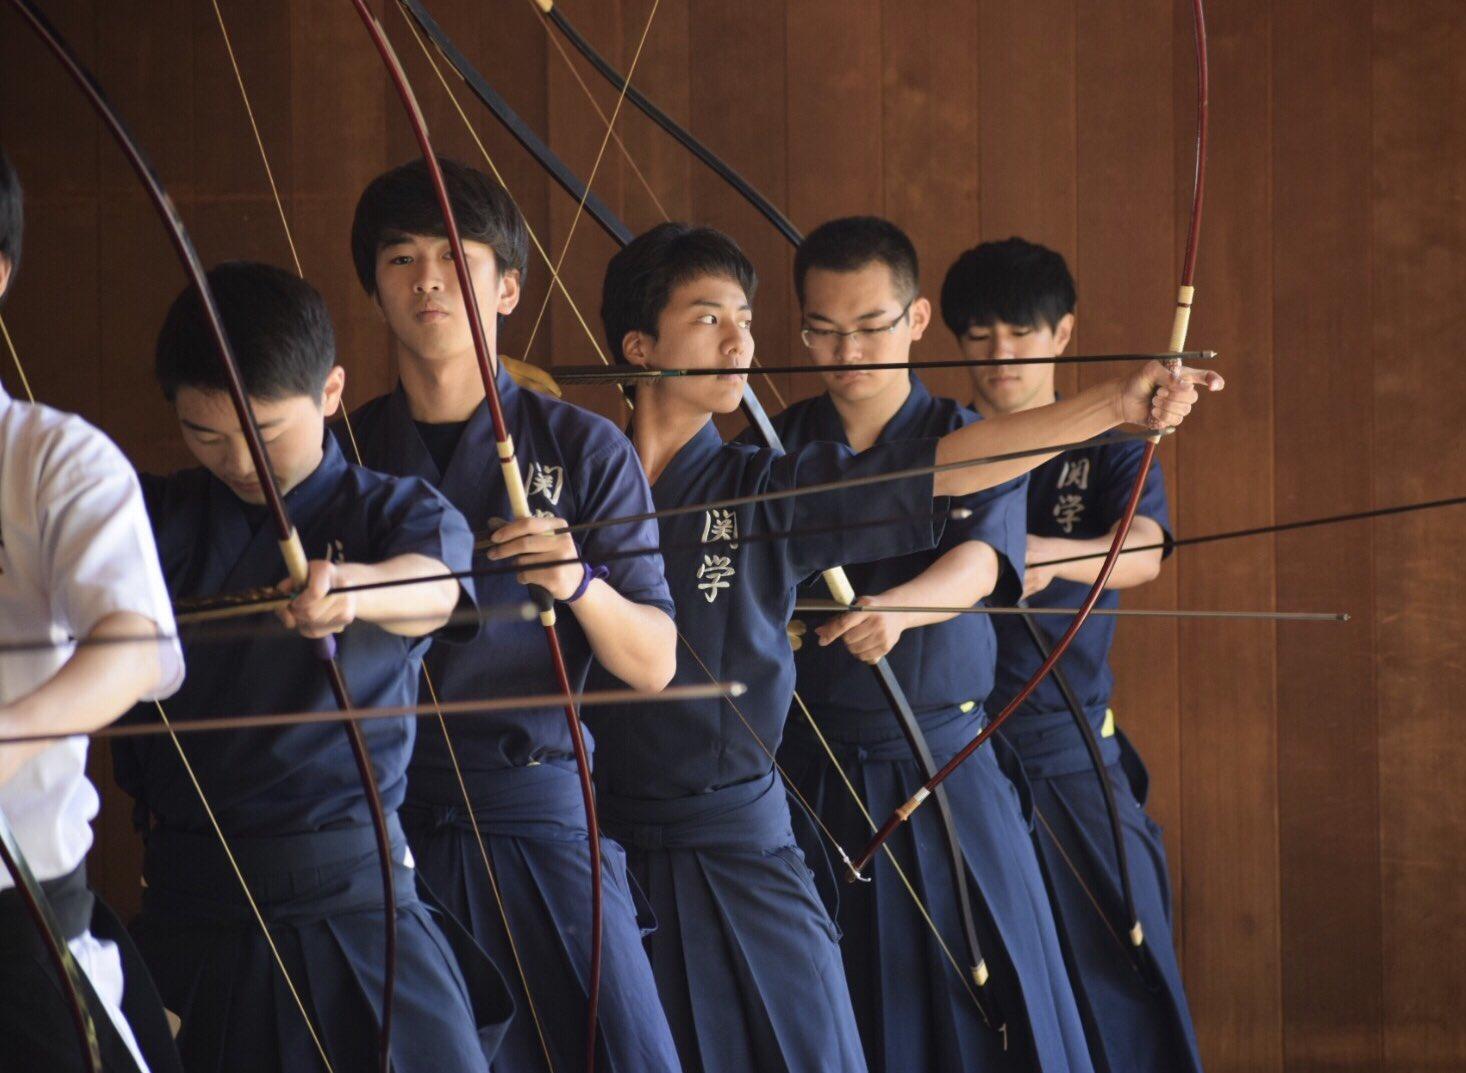 Cチーム 小西(国際2) 渡邊(教育1) 山本(社会1) 川原田(人福2)